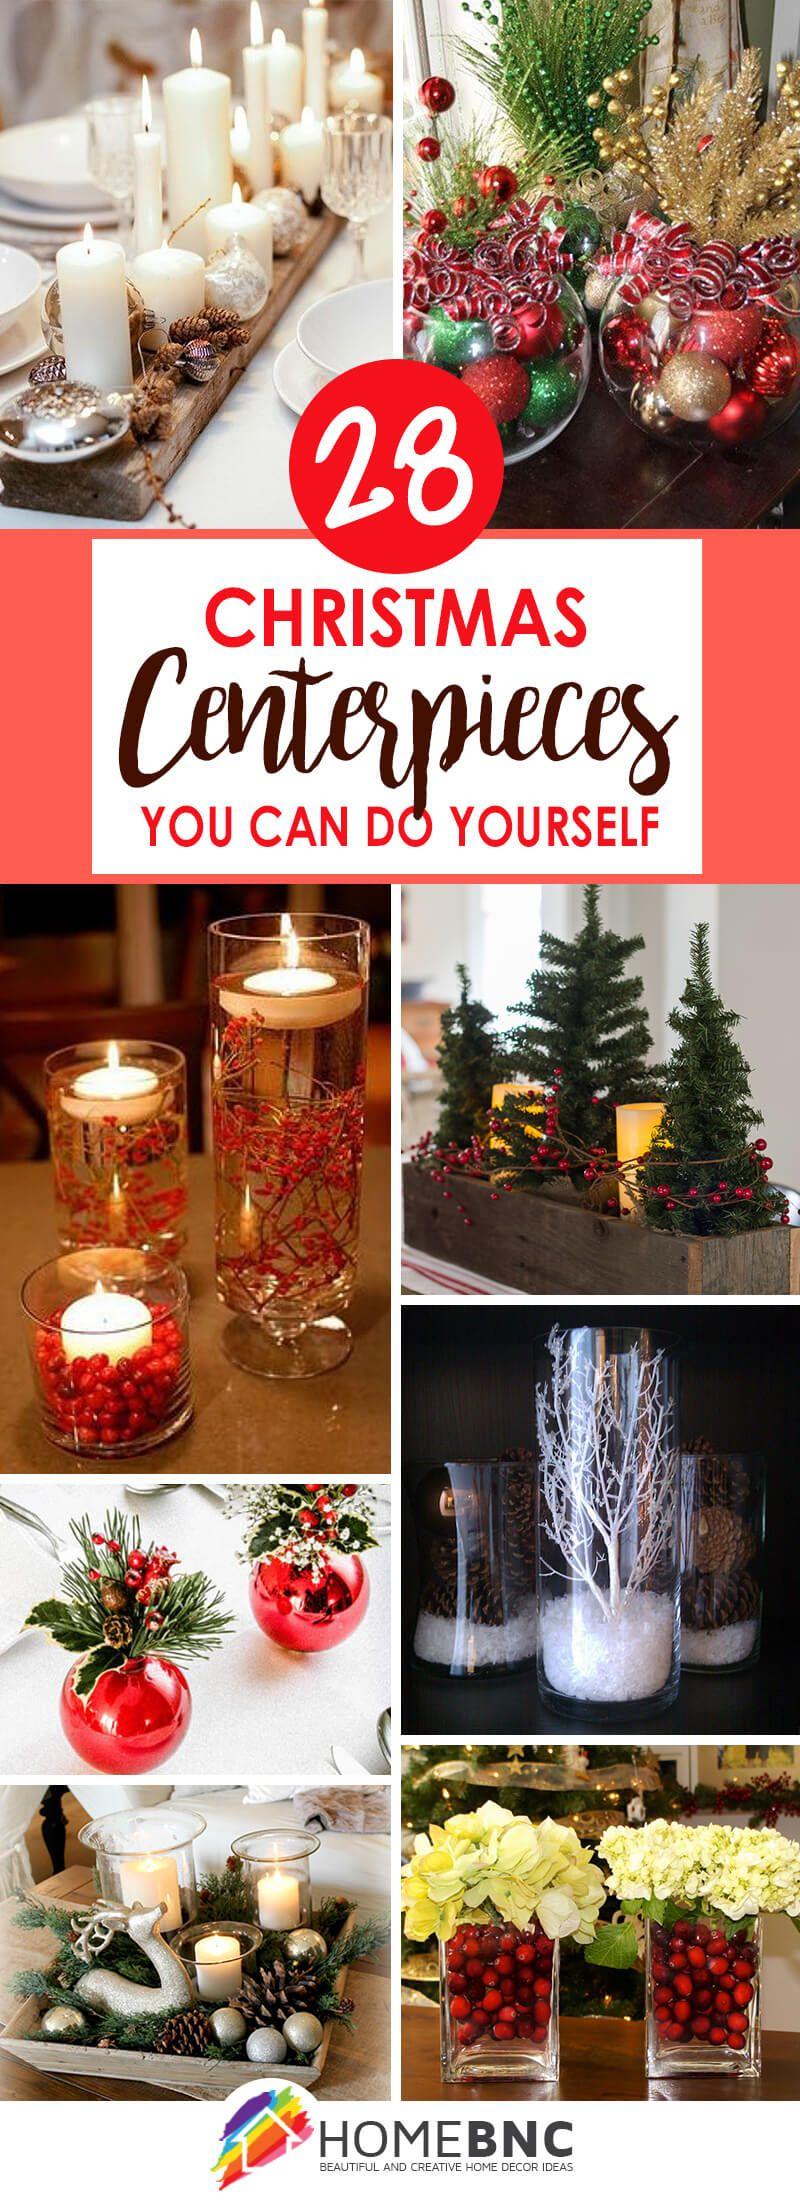 28 Fabulous Diy Christmas Centerpieces That Anyone Can Make Holiday Centerpieces Christmas Centerpieces Diy Christmas Table Decorations